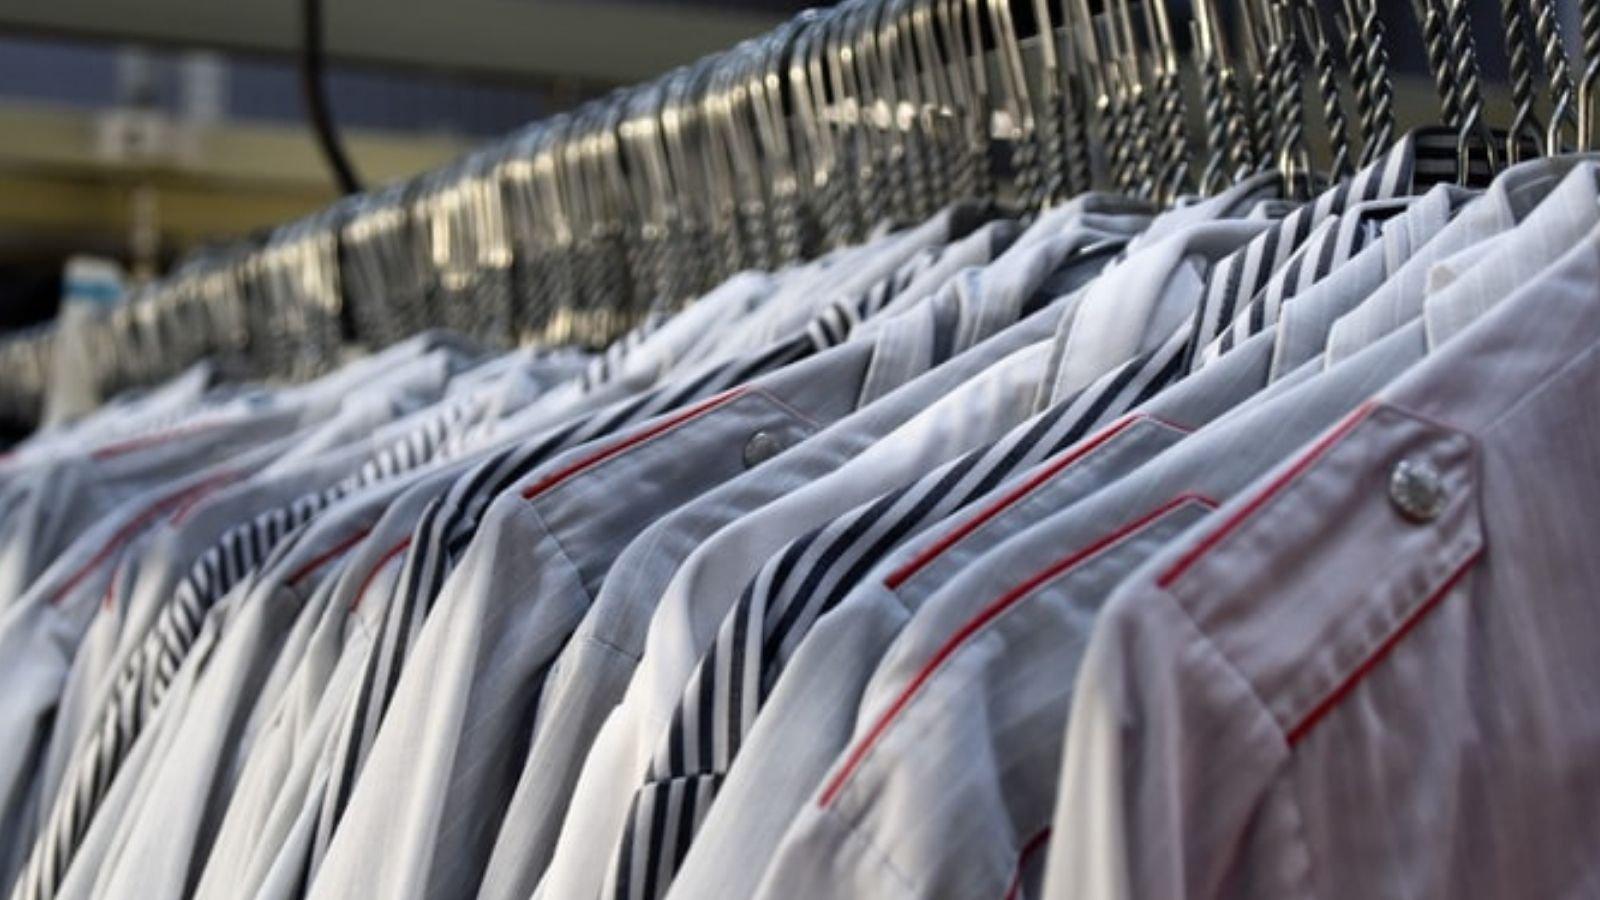 reusing clothes